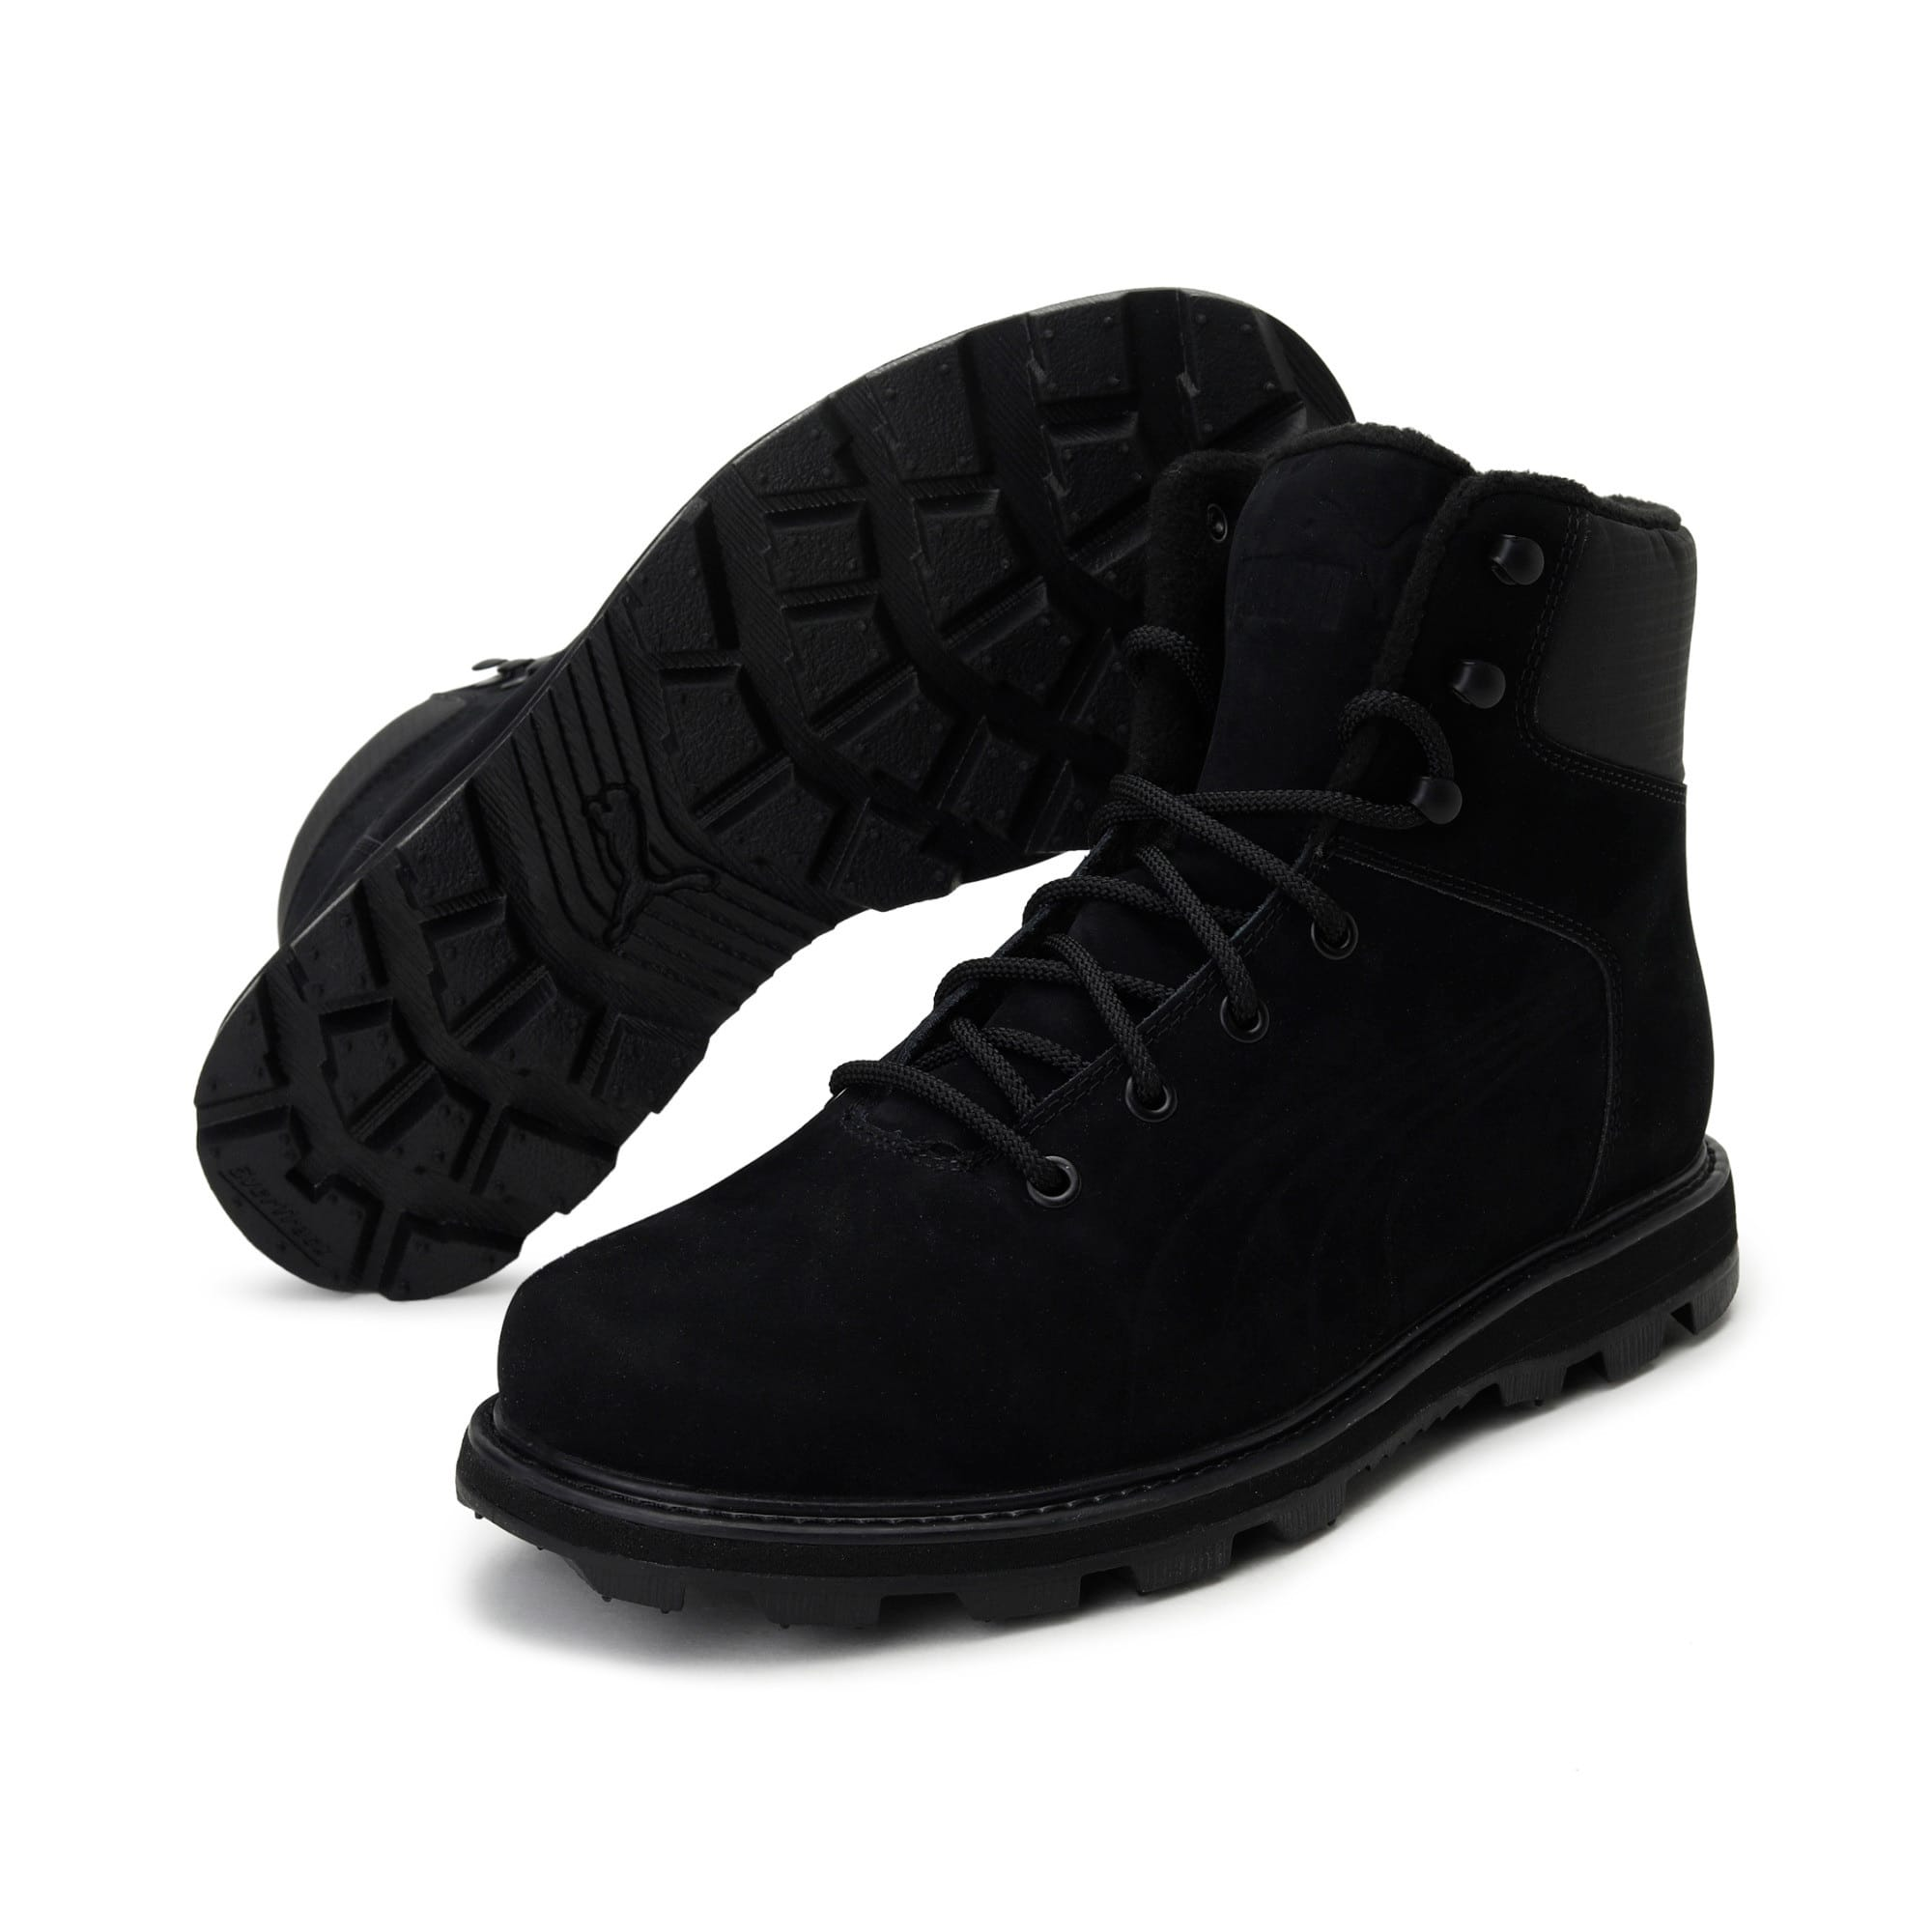 Thumbnail 2 of Desierto Fun Winter Boots, Puma Black- Black- Black, medium-IND